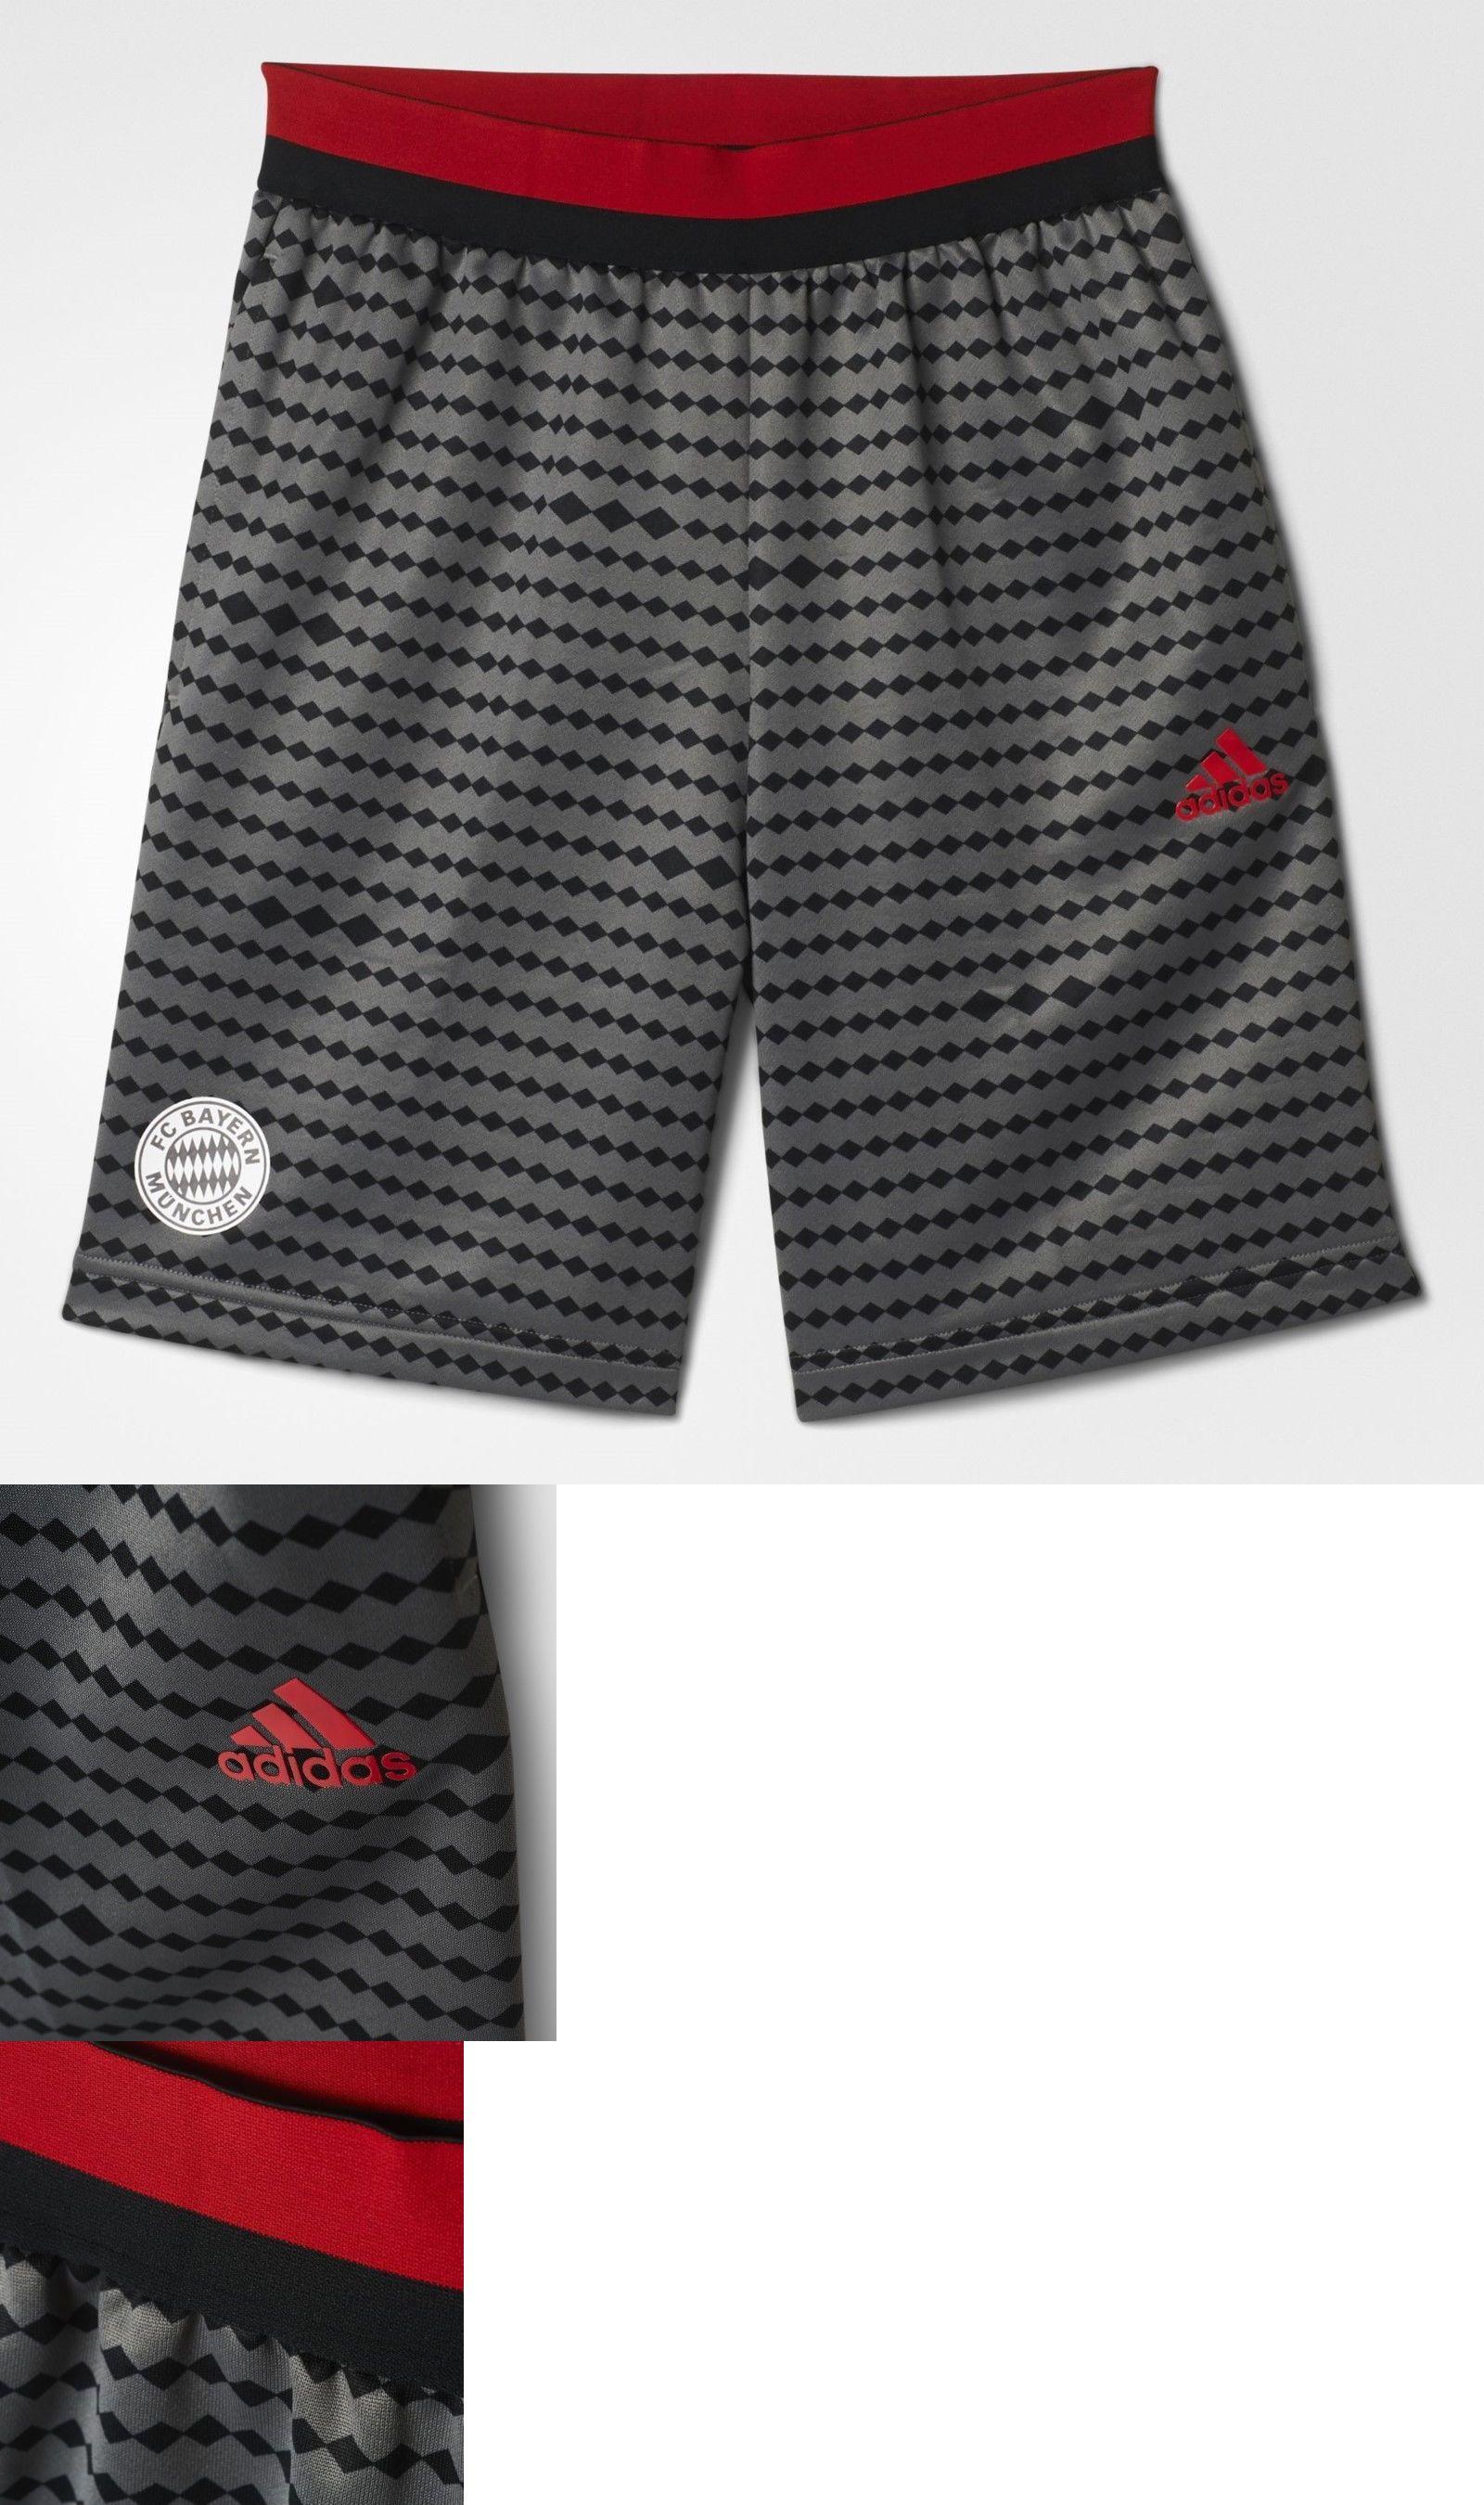 Shorts 175655  Adidas Boys Girls Youth Bayern Munich Soccer Shorts Nwt  Size  Youth Large -  BUY IT NOW ONLY   18.98 on  eBay  shorts  adidas   girls  youth ... ef4595c92e